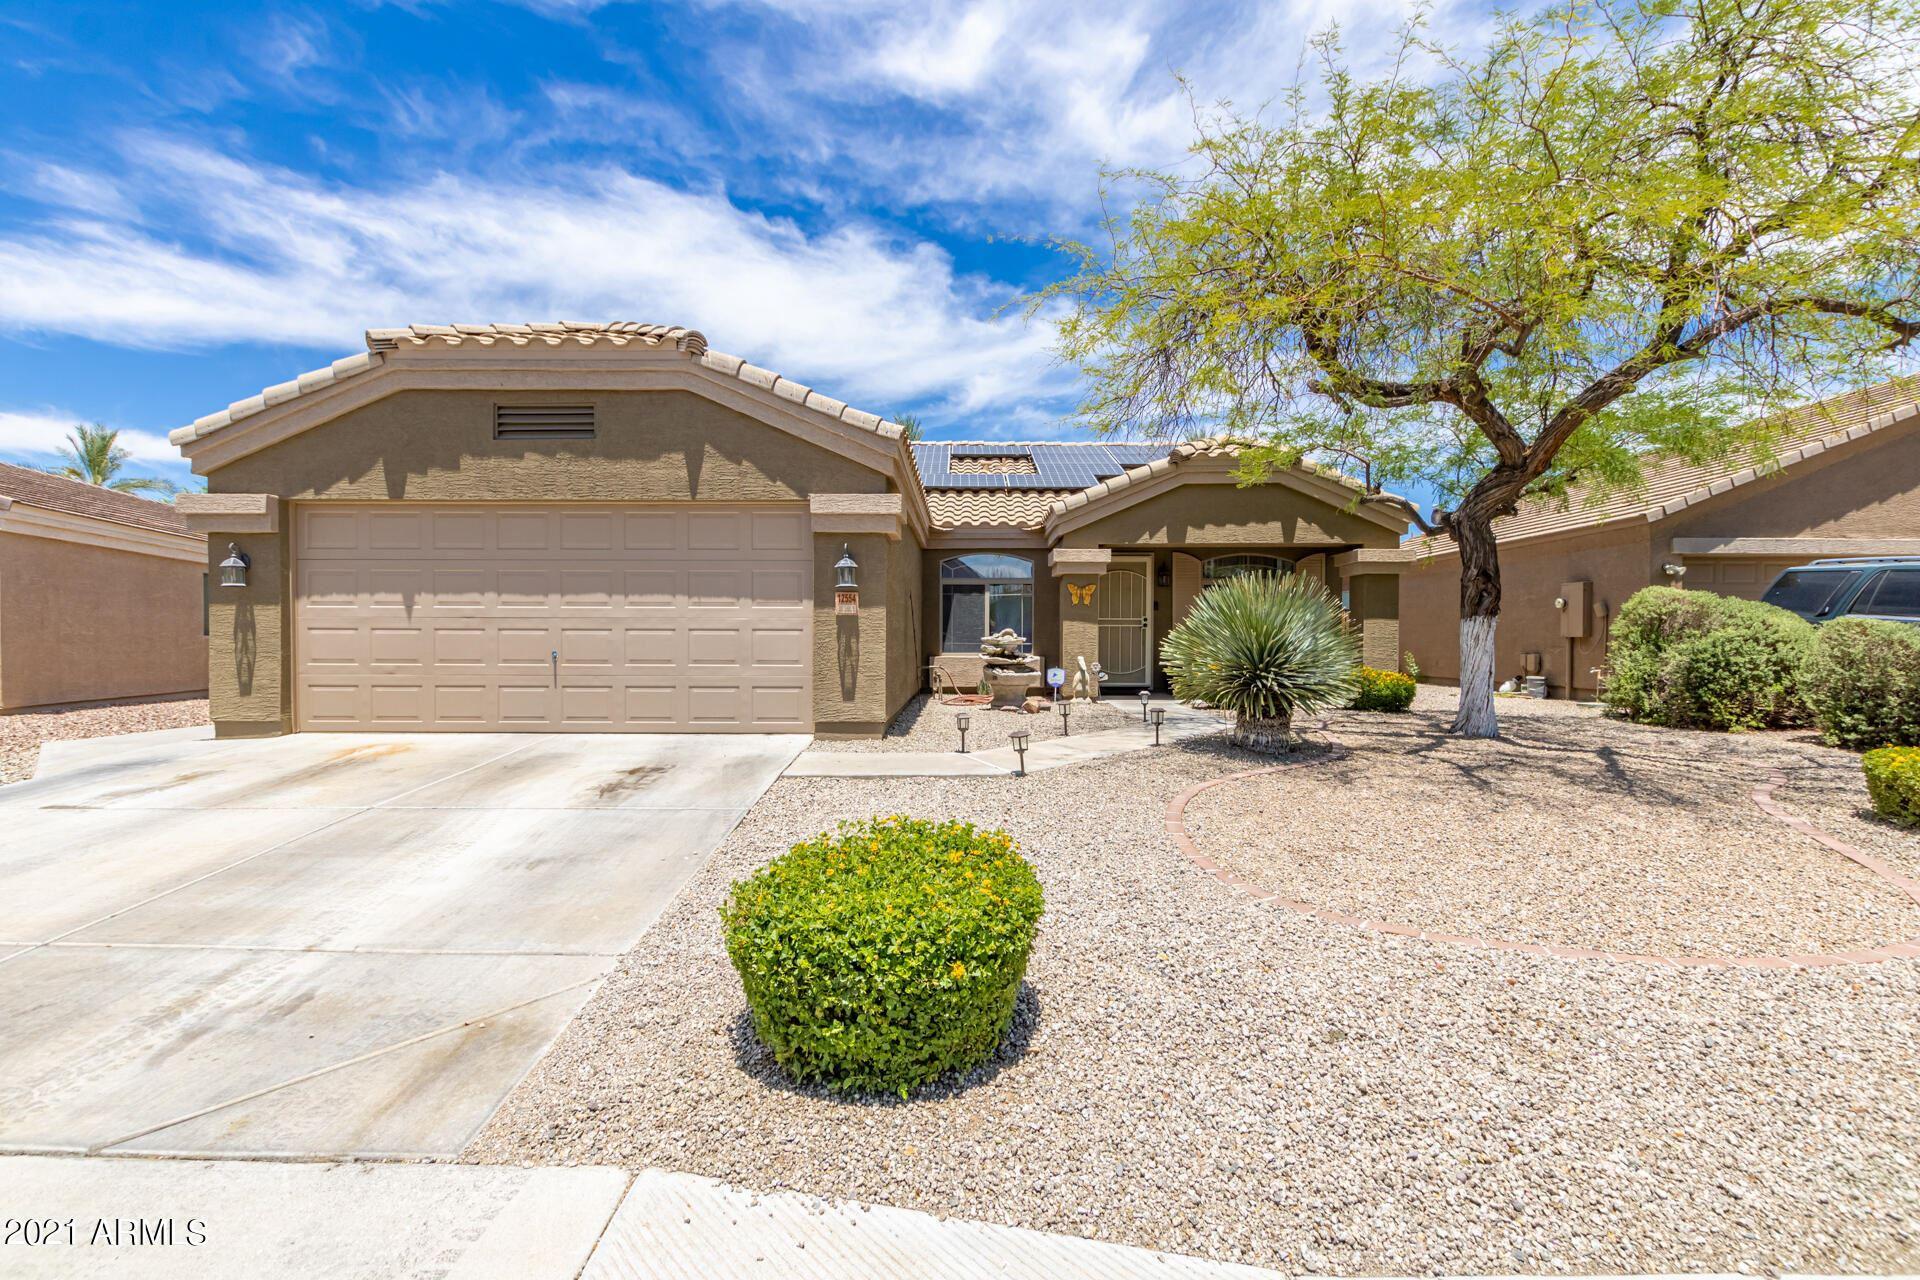 Photo of 12554 W HEARN Road, El Mirage, AZ 85335 (MLS # 6249121)